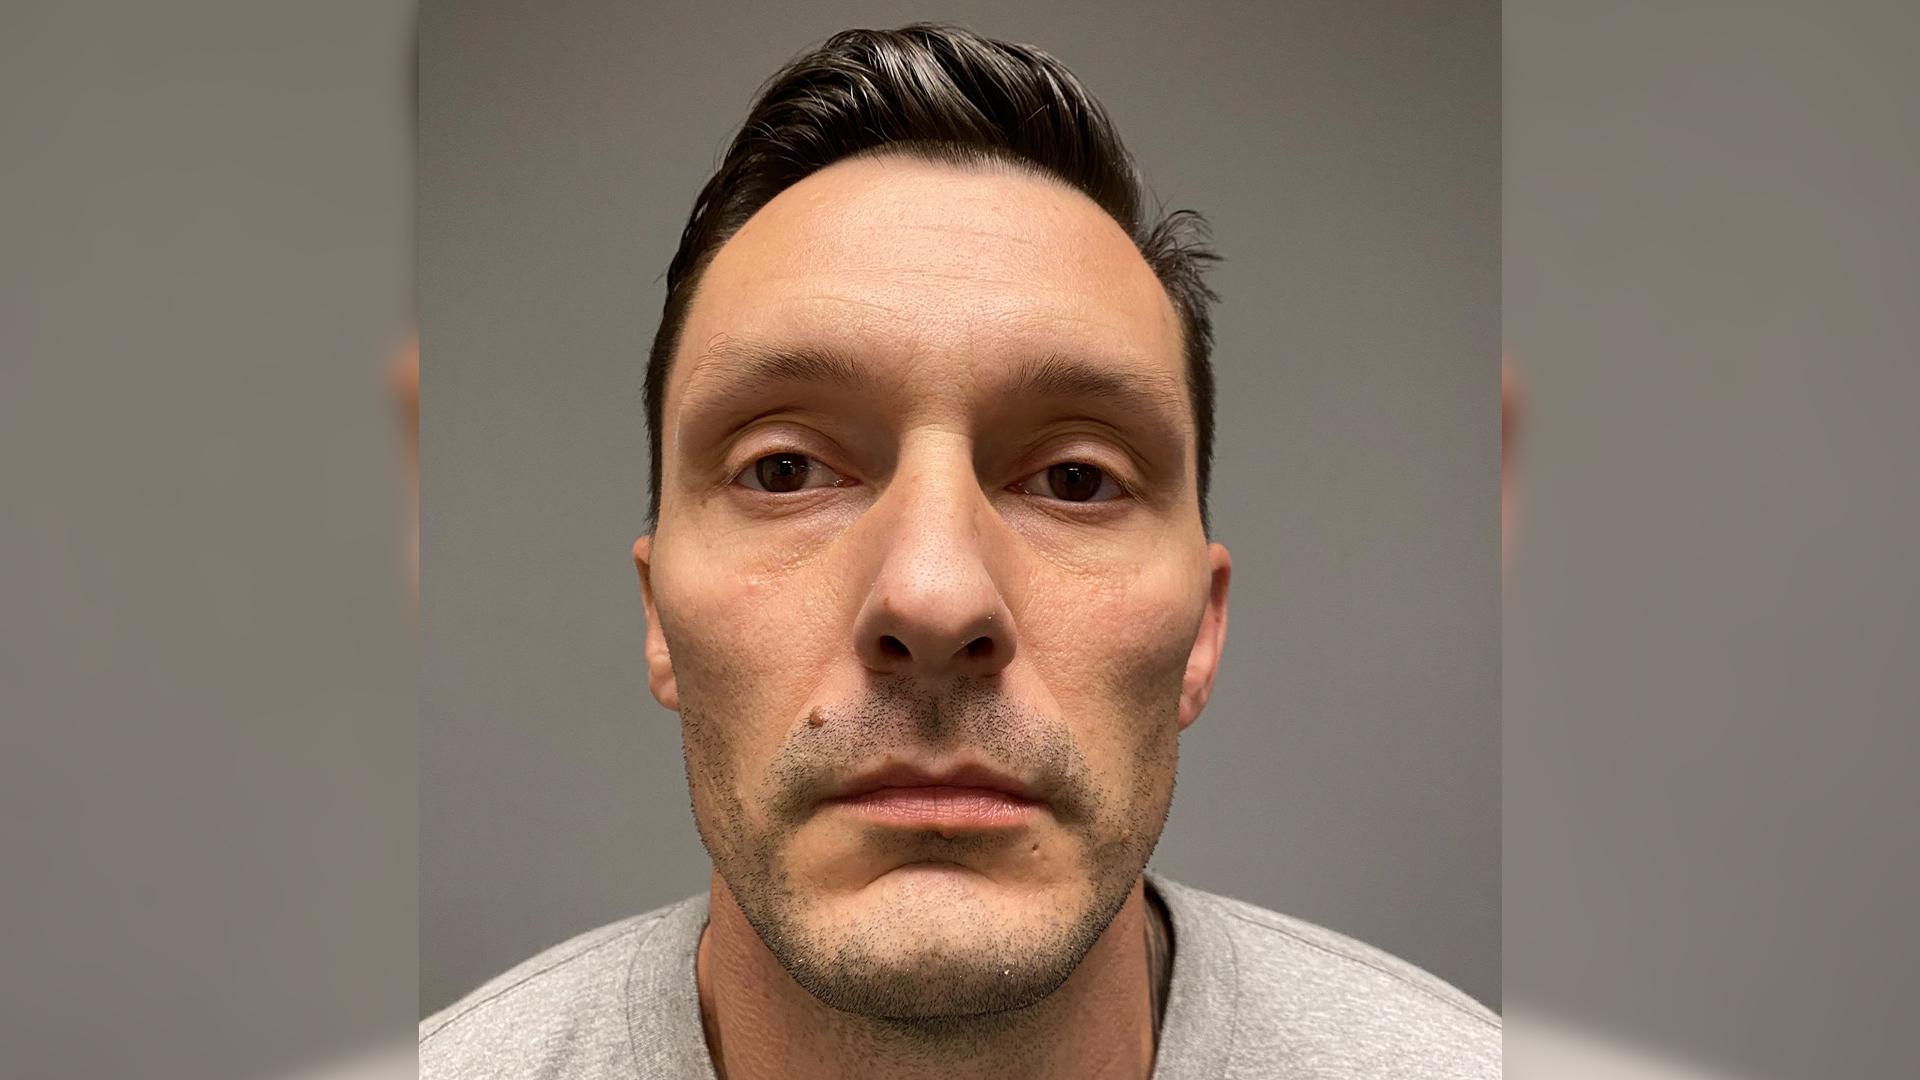 Troy Clowers, 36